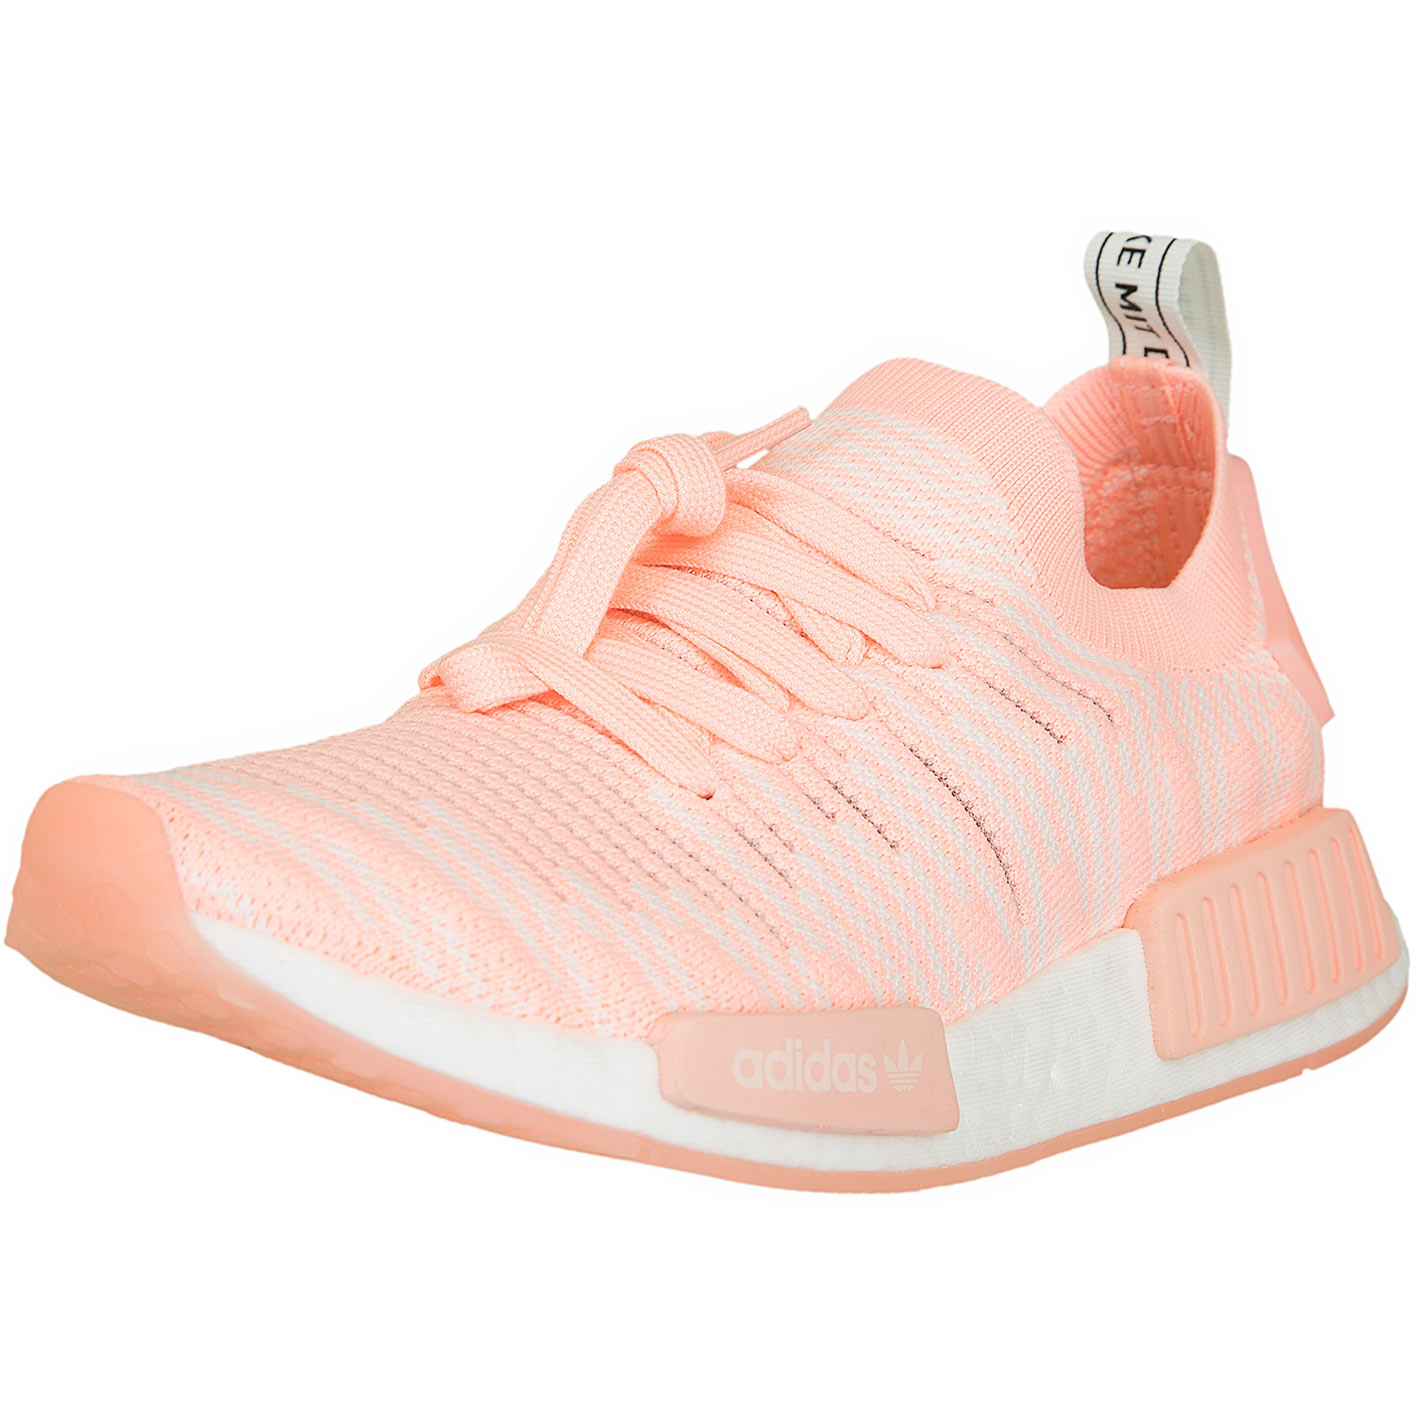 Adidas Nmd R1 Damen Pink